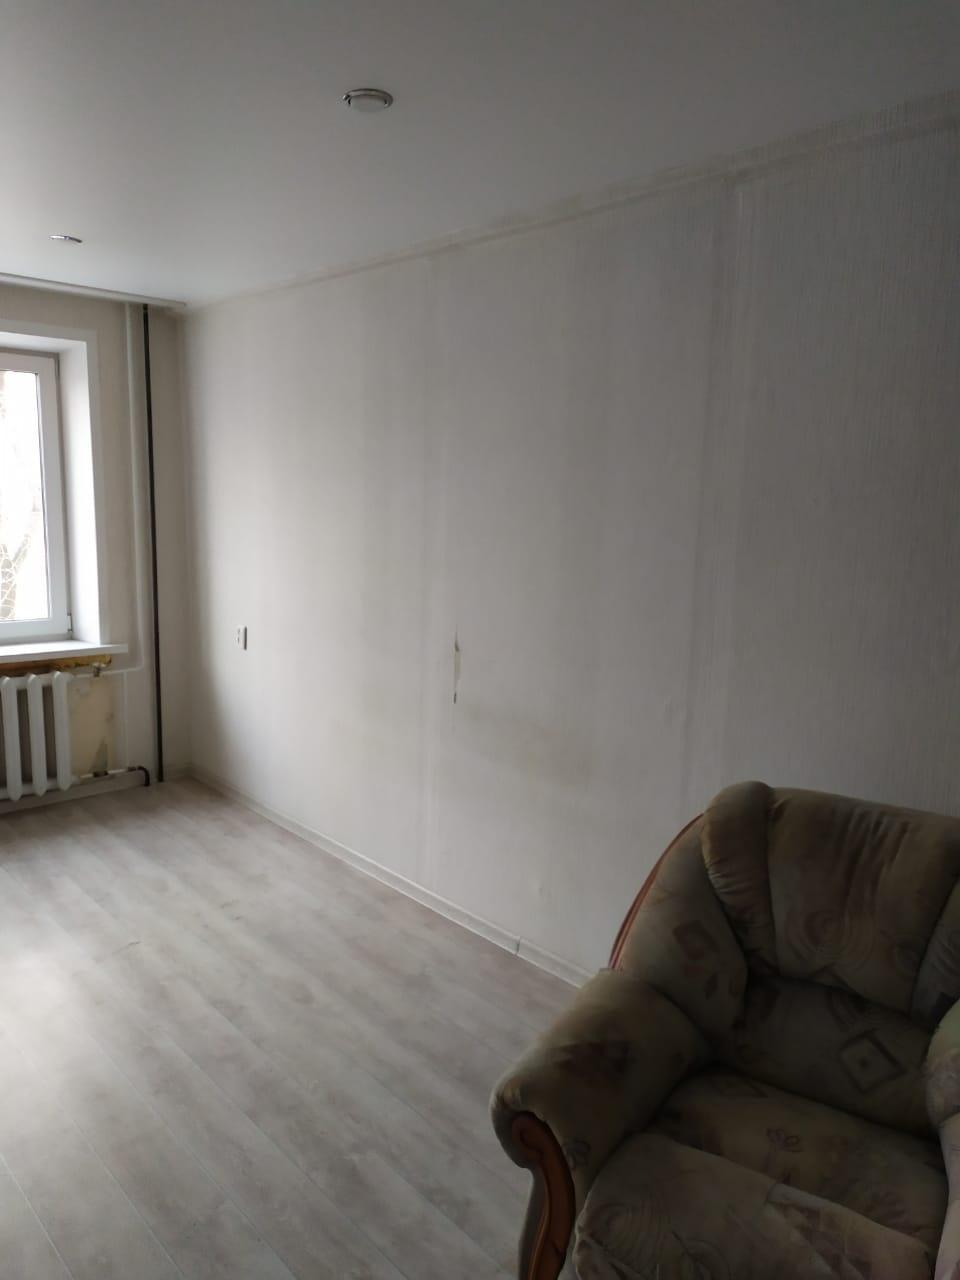 3к квартира улица Гастелло, 32 | 16000 | аренда в Красноярске фото 0